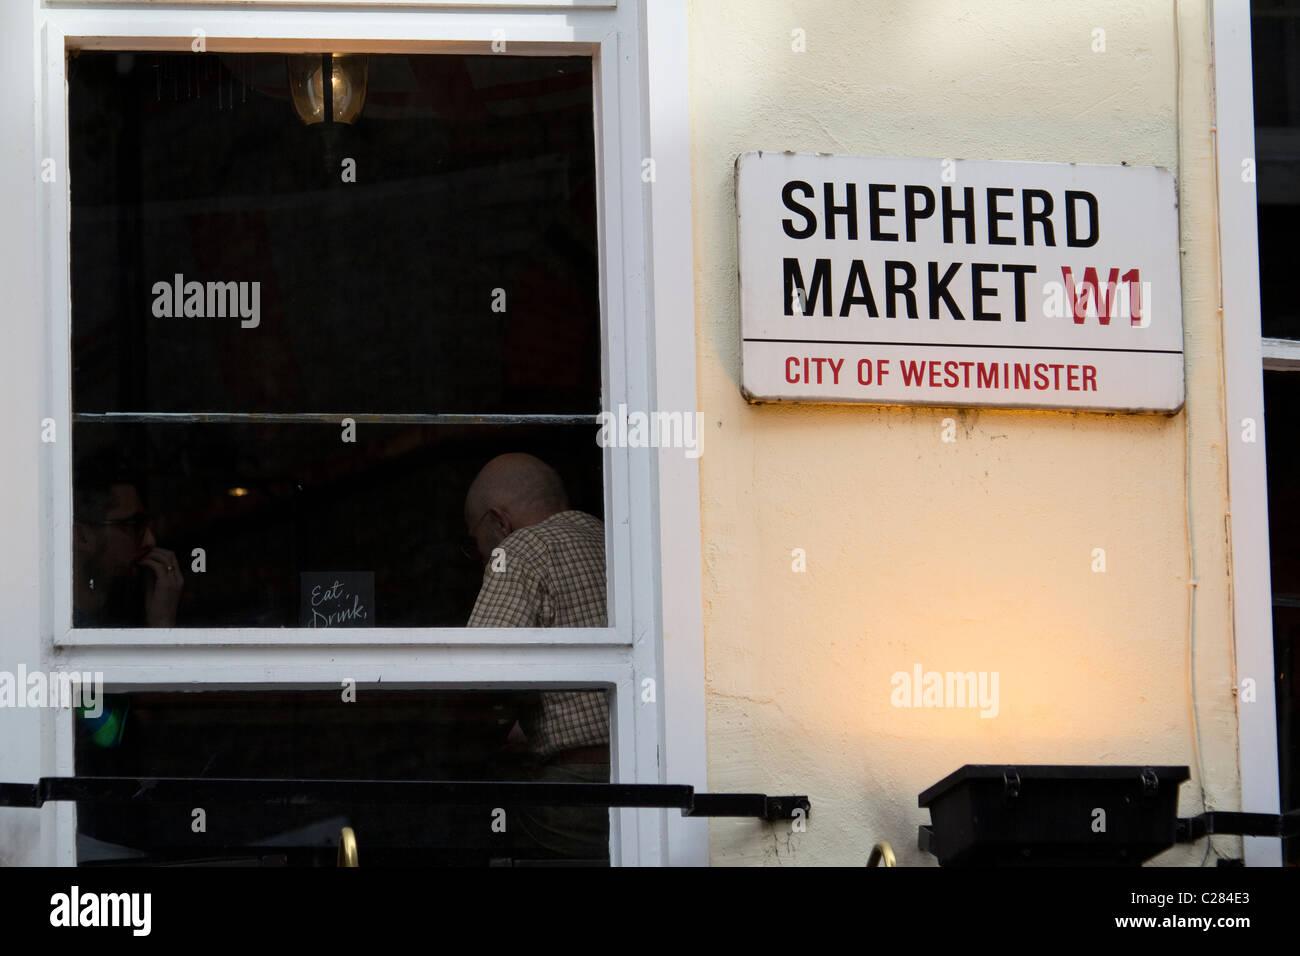 Shepherds Market street sign next to pub window - Stock Image